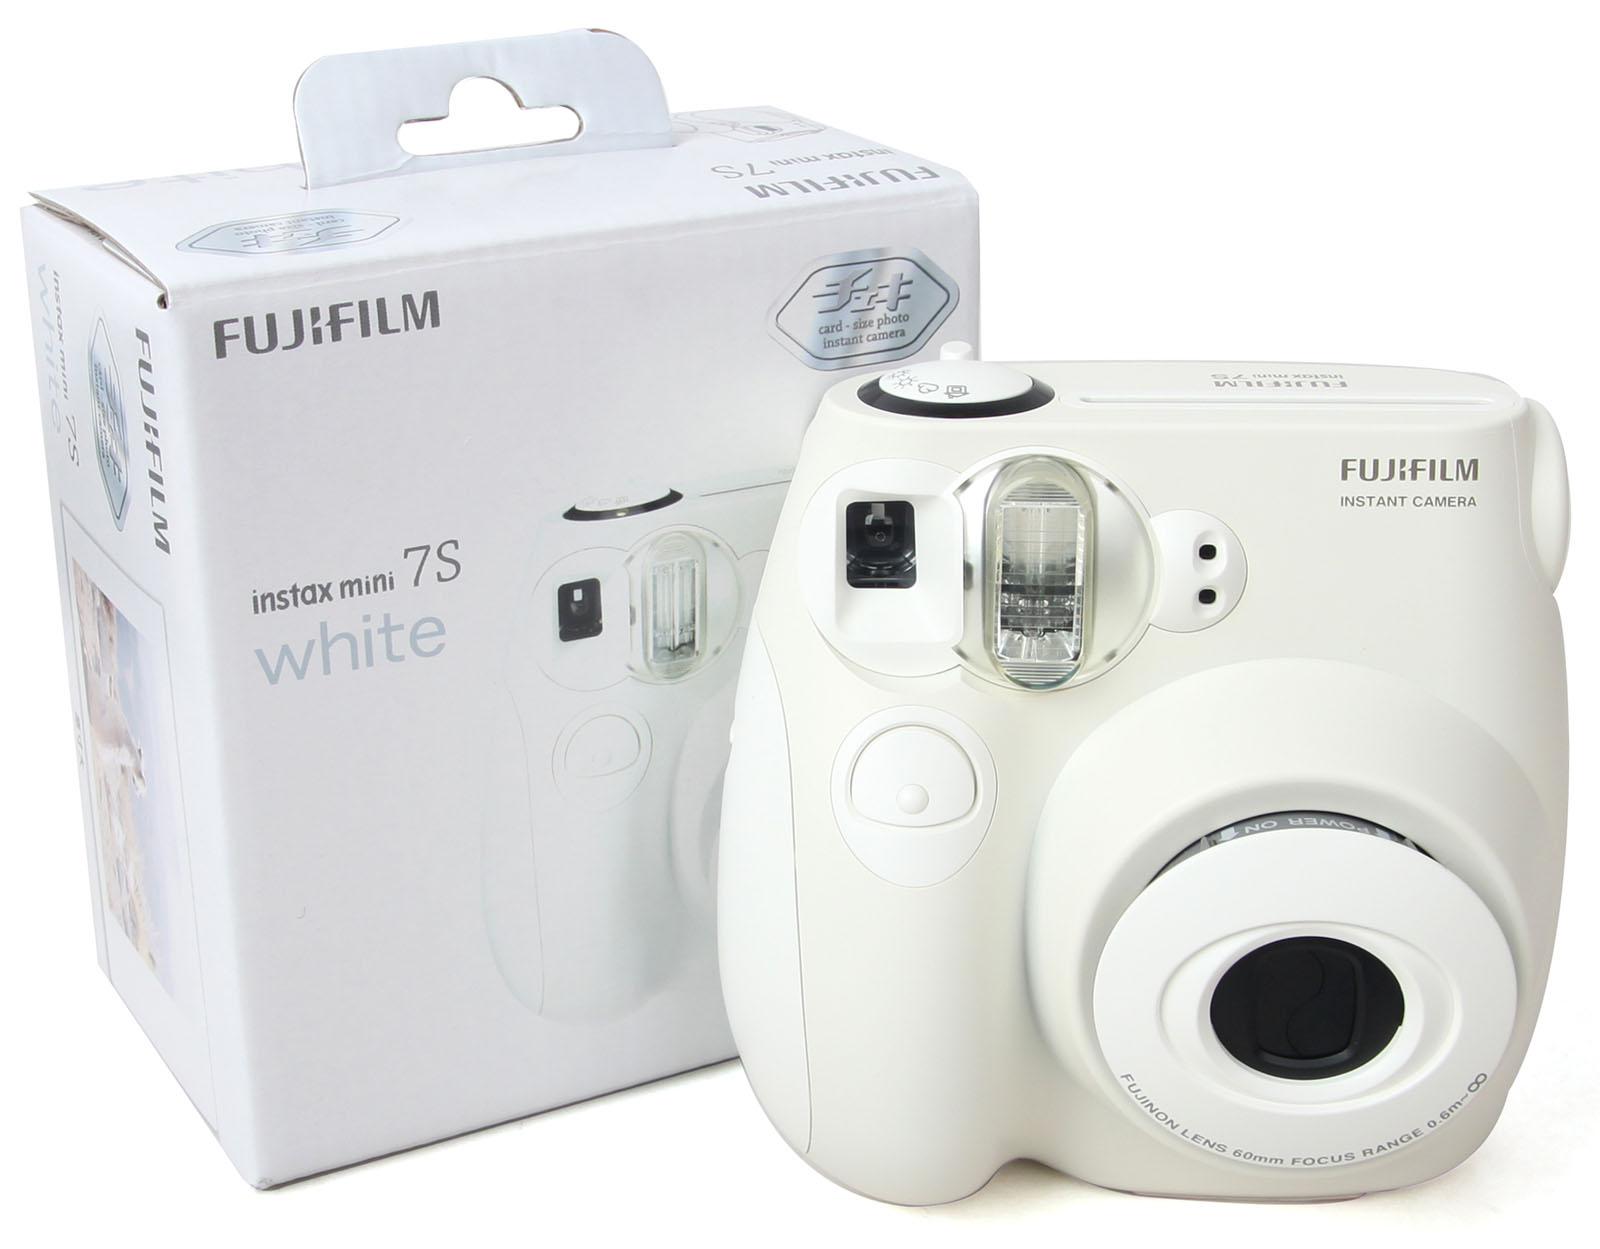 fujifilm instax instant camera history blank polaroid. Black Bedroom Furniture Sets. Home Design Ideas